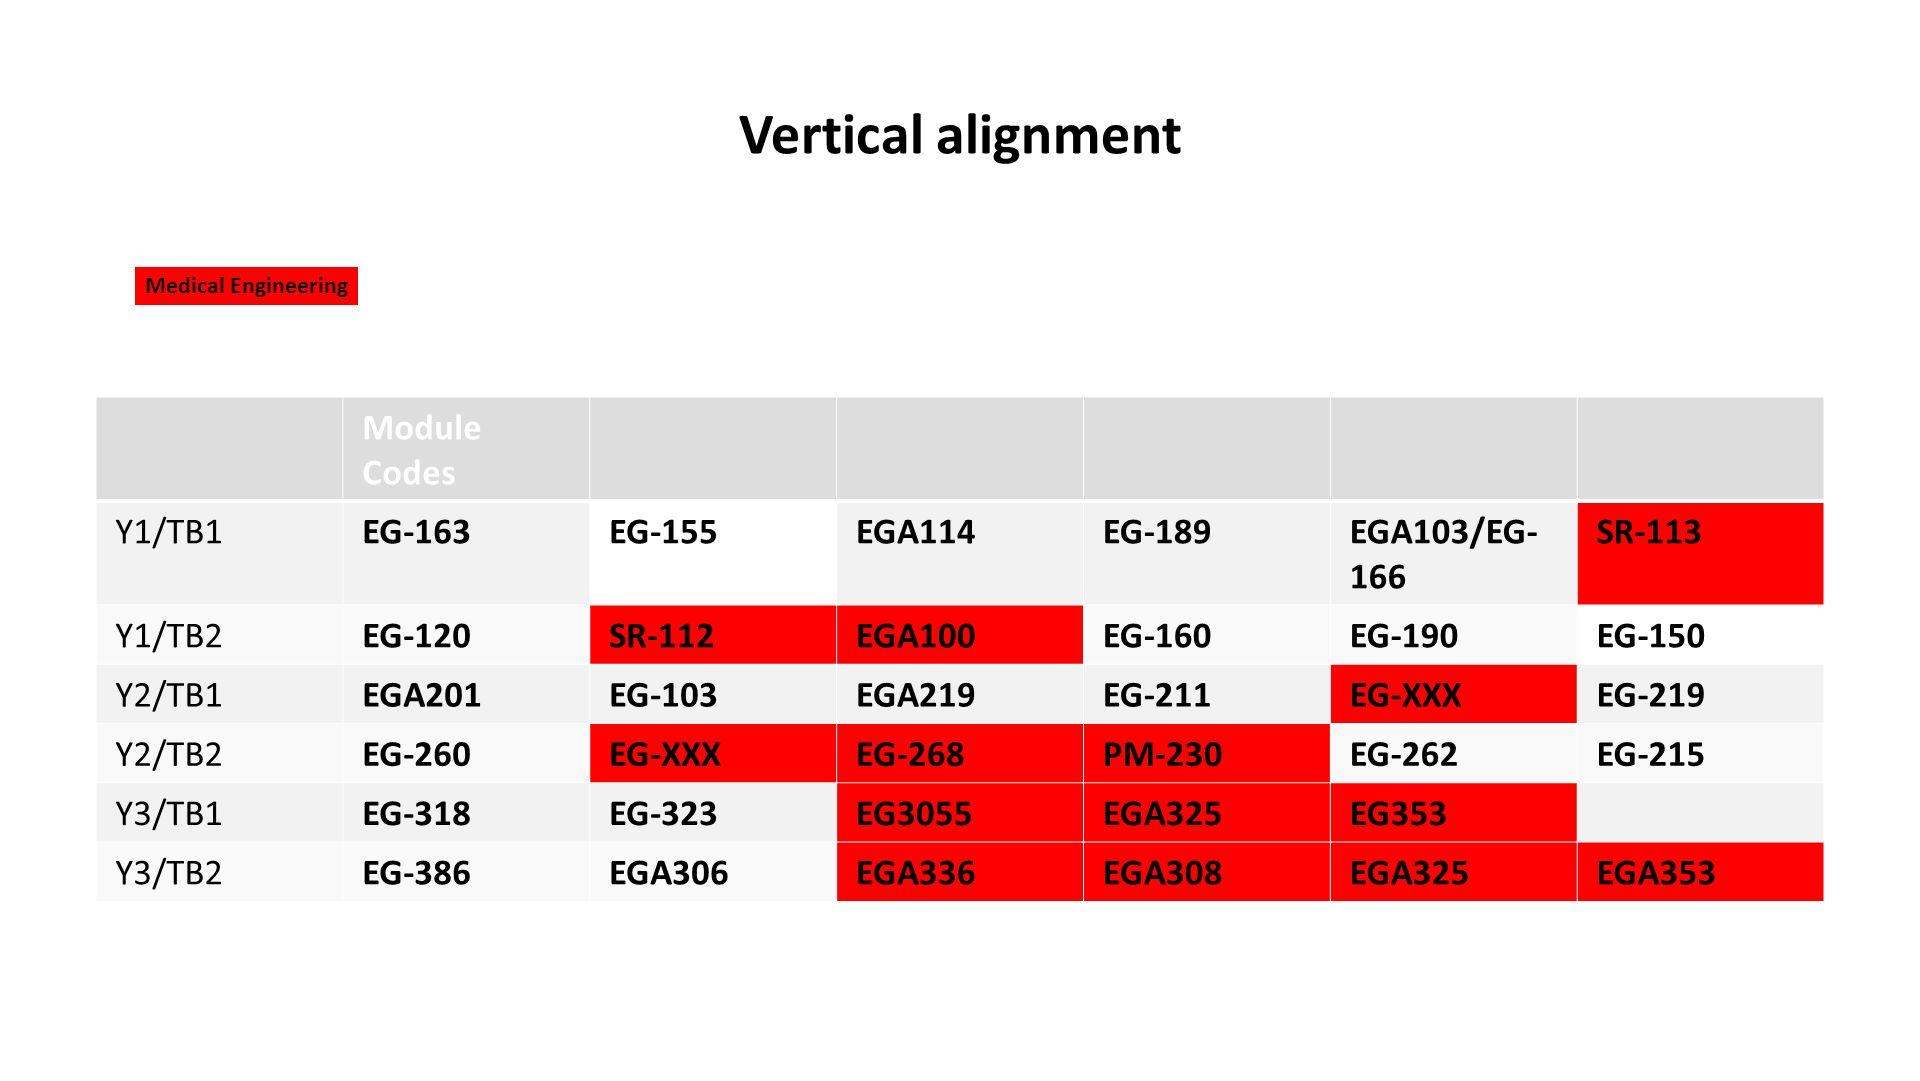 Vertical alignment Module Codes Y1/TB1EG-163EG-155EGA114EG-189EGA103/EG- 166 SR-113 Y1/TB2EG-120SR-112EGA100EG-160EG-190EG-150 Y2/TB1EGA201EG-103EGA219EG-211EG-XXXEG-219 Y2/TB2EG-260EG-XXXEG-268PM-230EG-262EG-215 Y3/TB1EG-318EG-323EG3055EGA325EG353 Y3/TB2EG-386EGA306EGA336EGA308EGA325EGA353 Medical Engineering